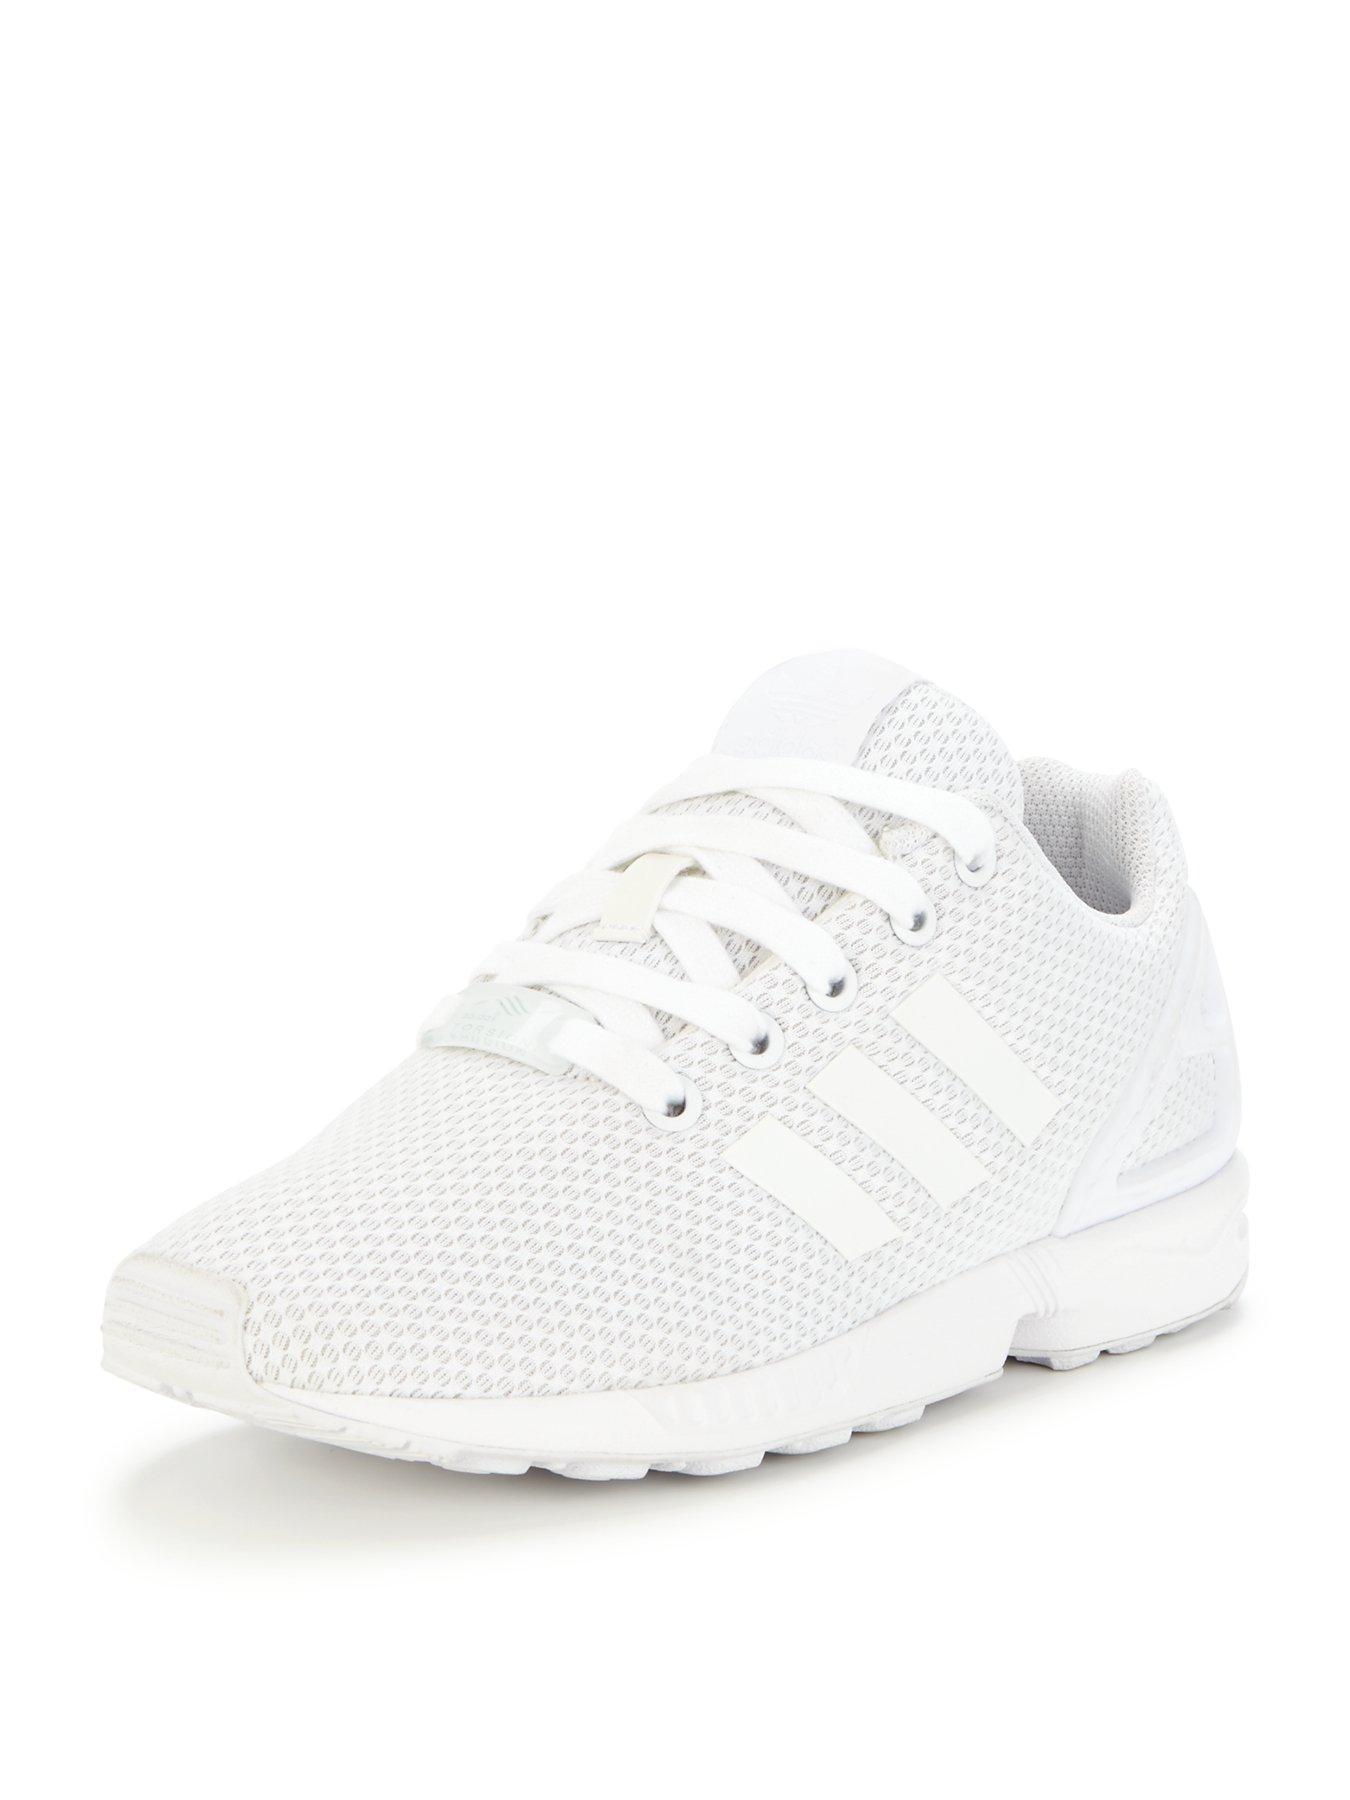 inexpensive adidas zx flux junior white noise c5eee 3042c